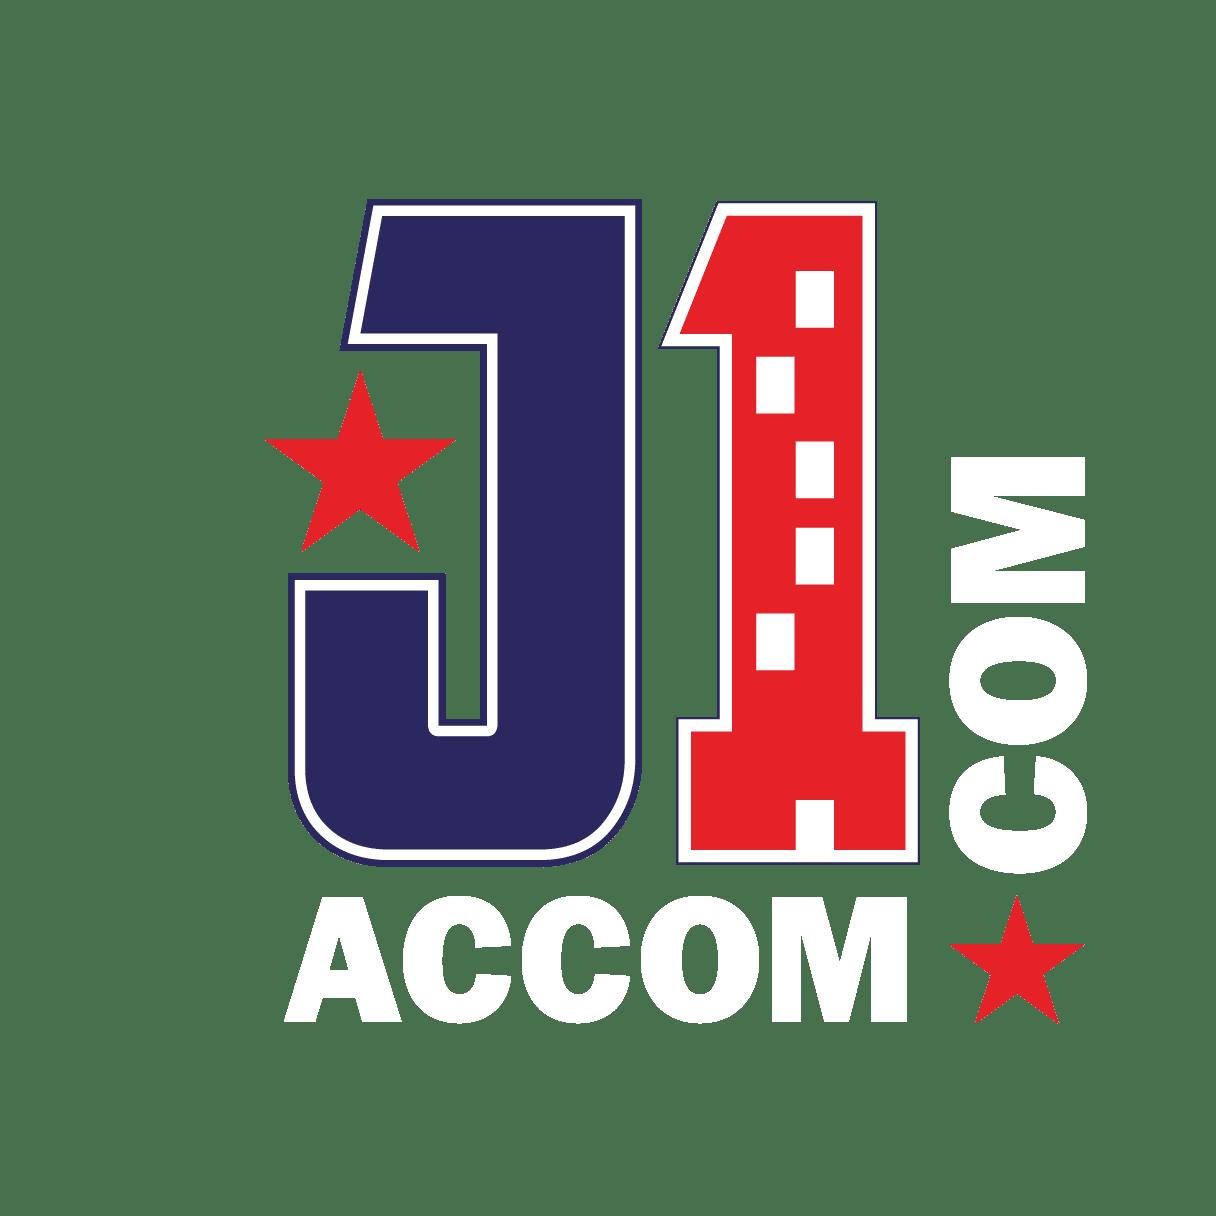 J1 Accom